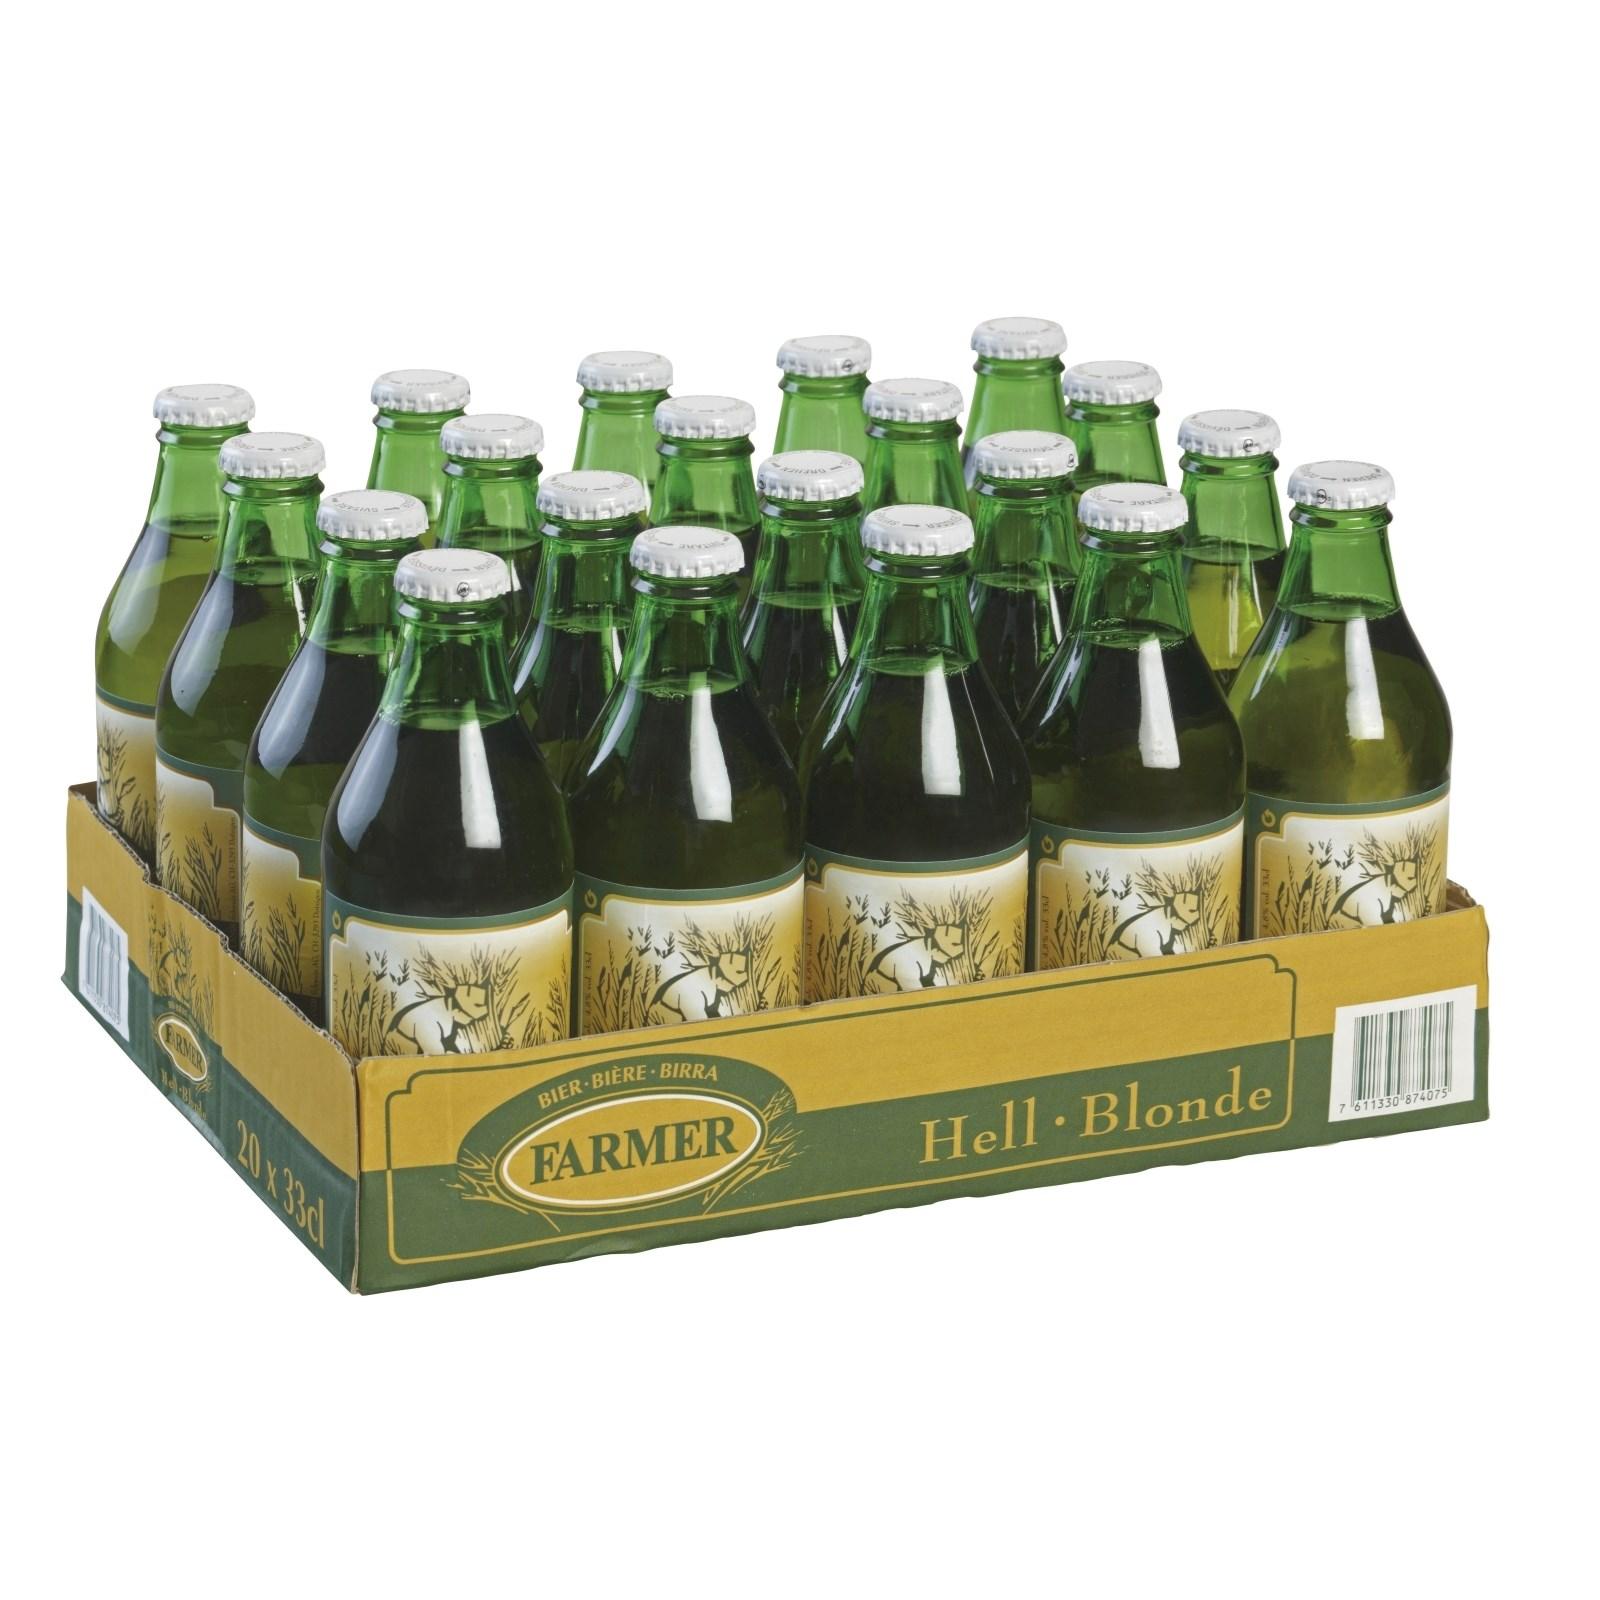 lagerbier farmer 20 33 cl biere mit alkohol landi. Black Bedroom Furniture Sets. Home Design Ideas